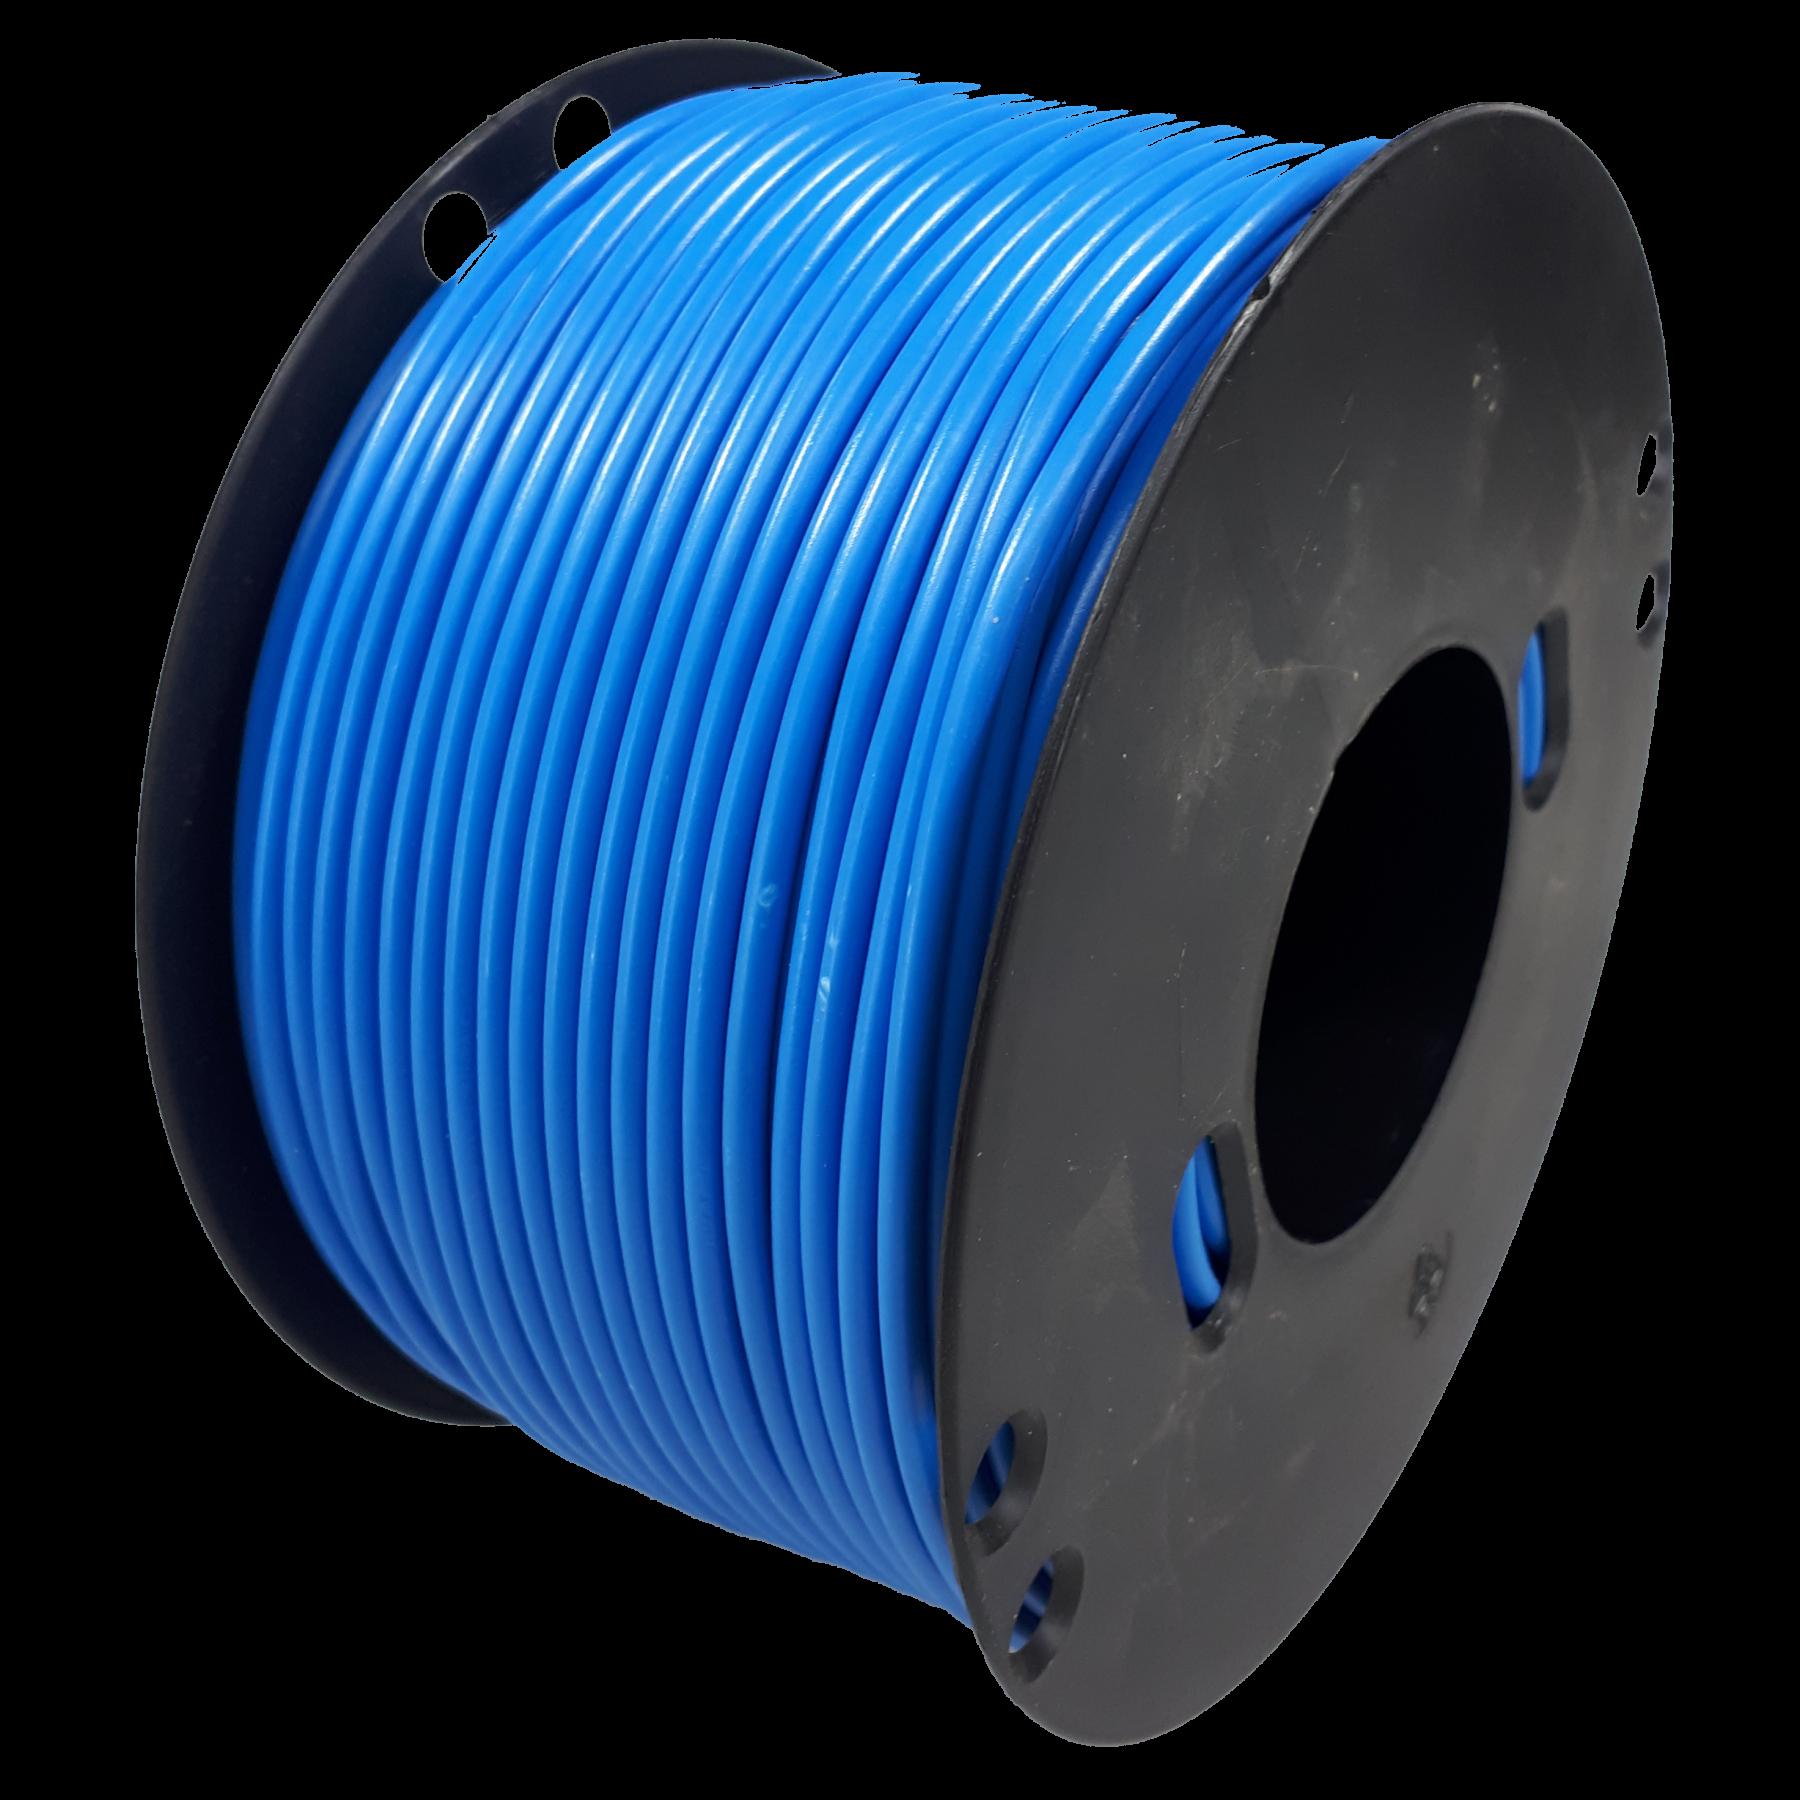 Kabel 2,5 blauw 100m haspel